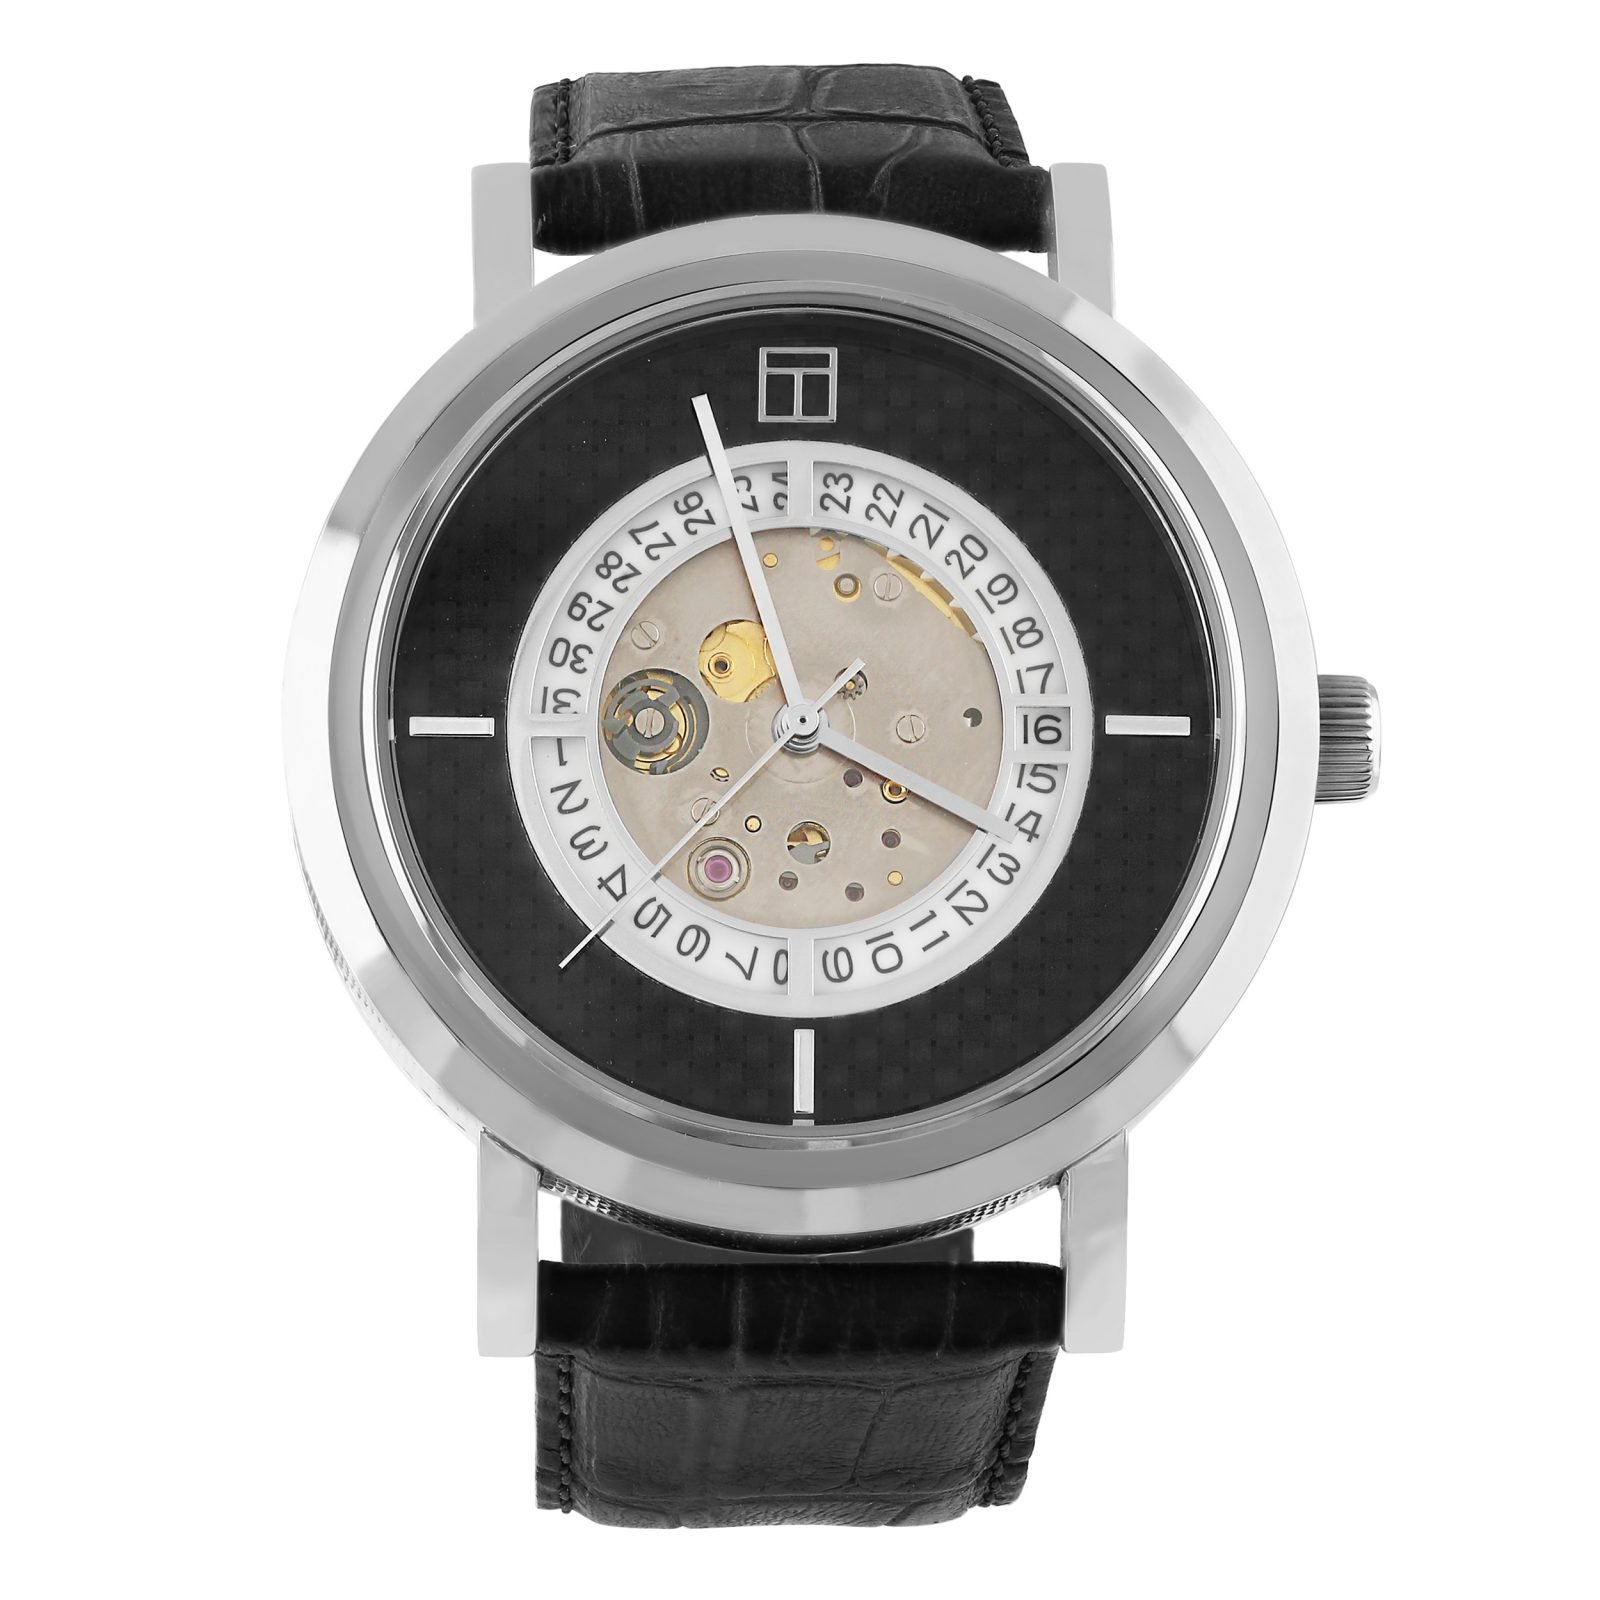 Davide Cotugno Executive Tailors Men's Custom Clothing - Tateossian Automatic Watch